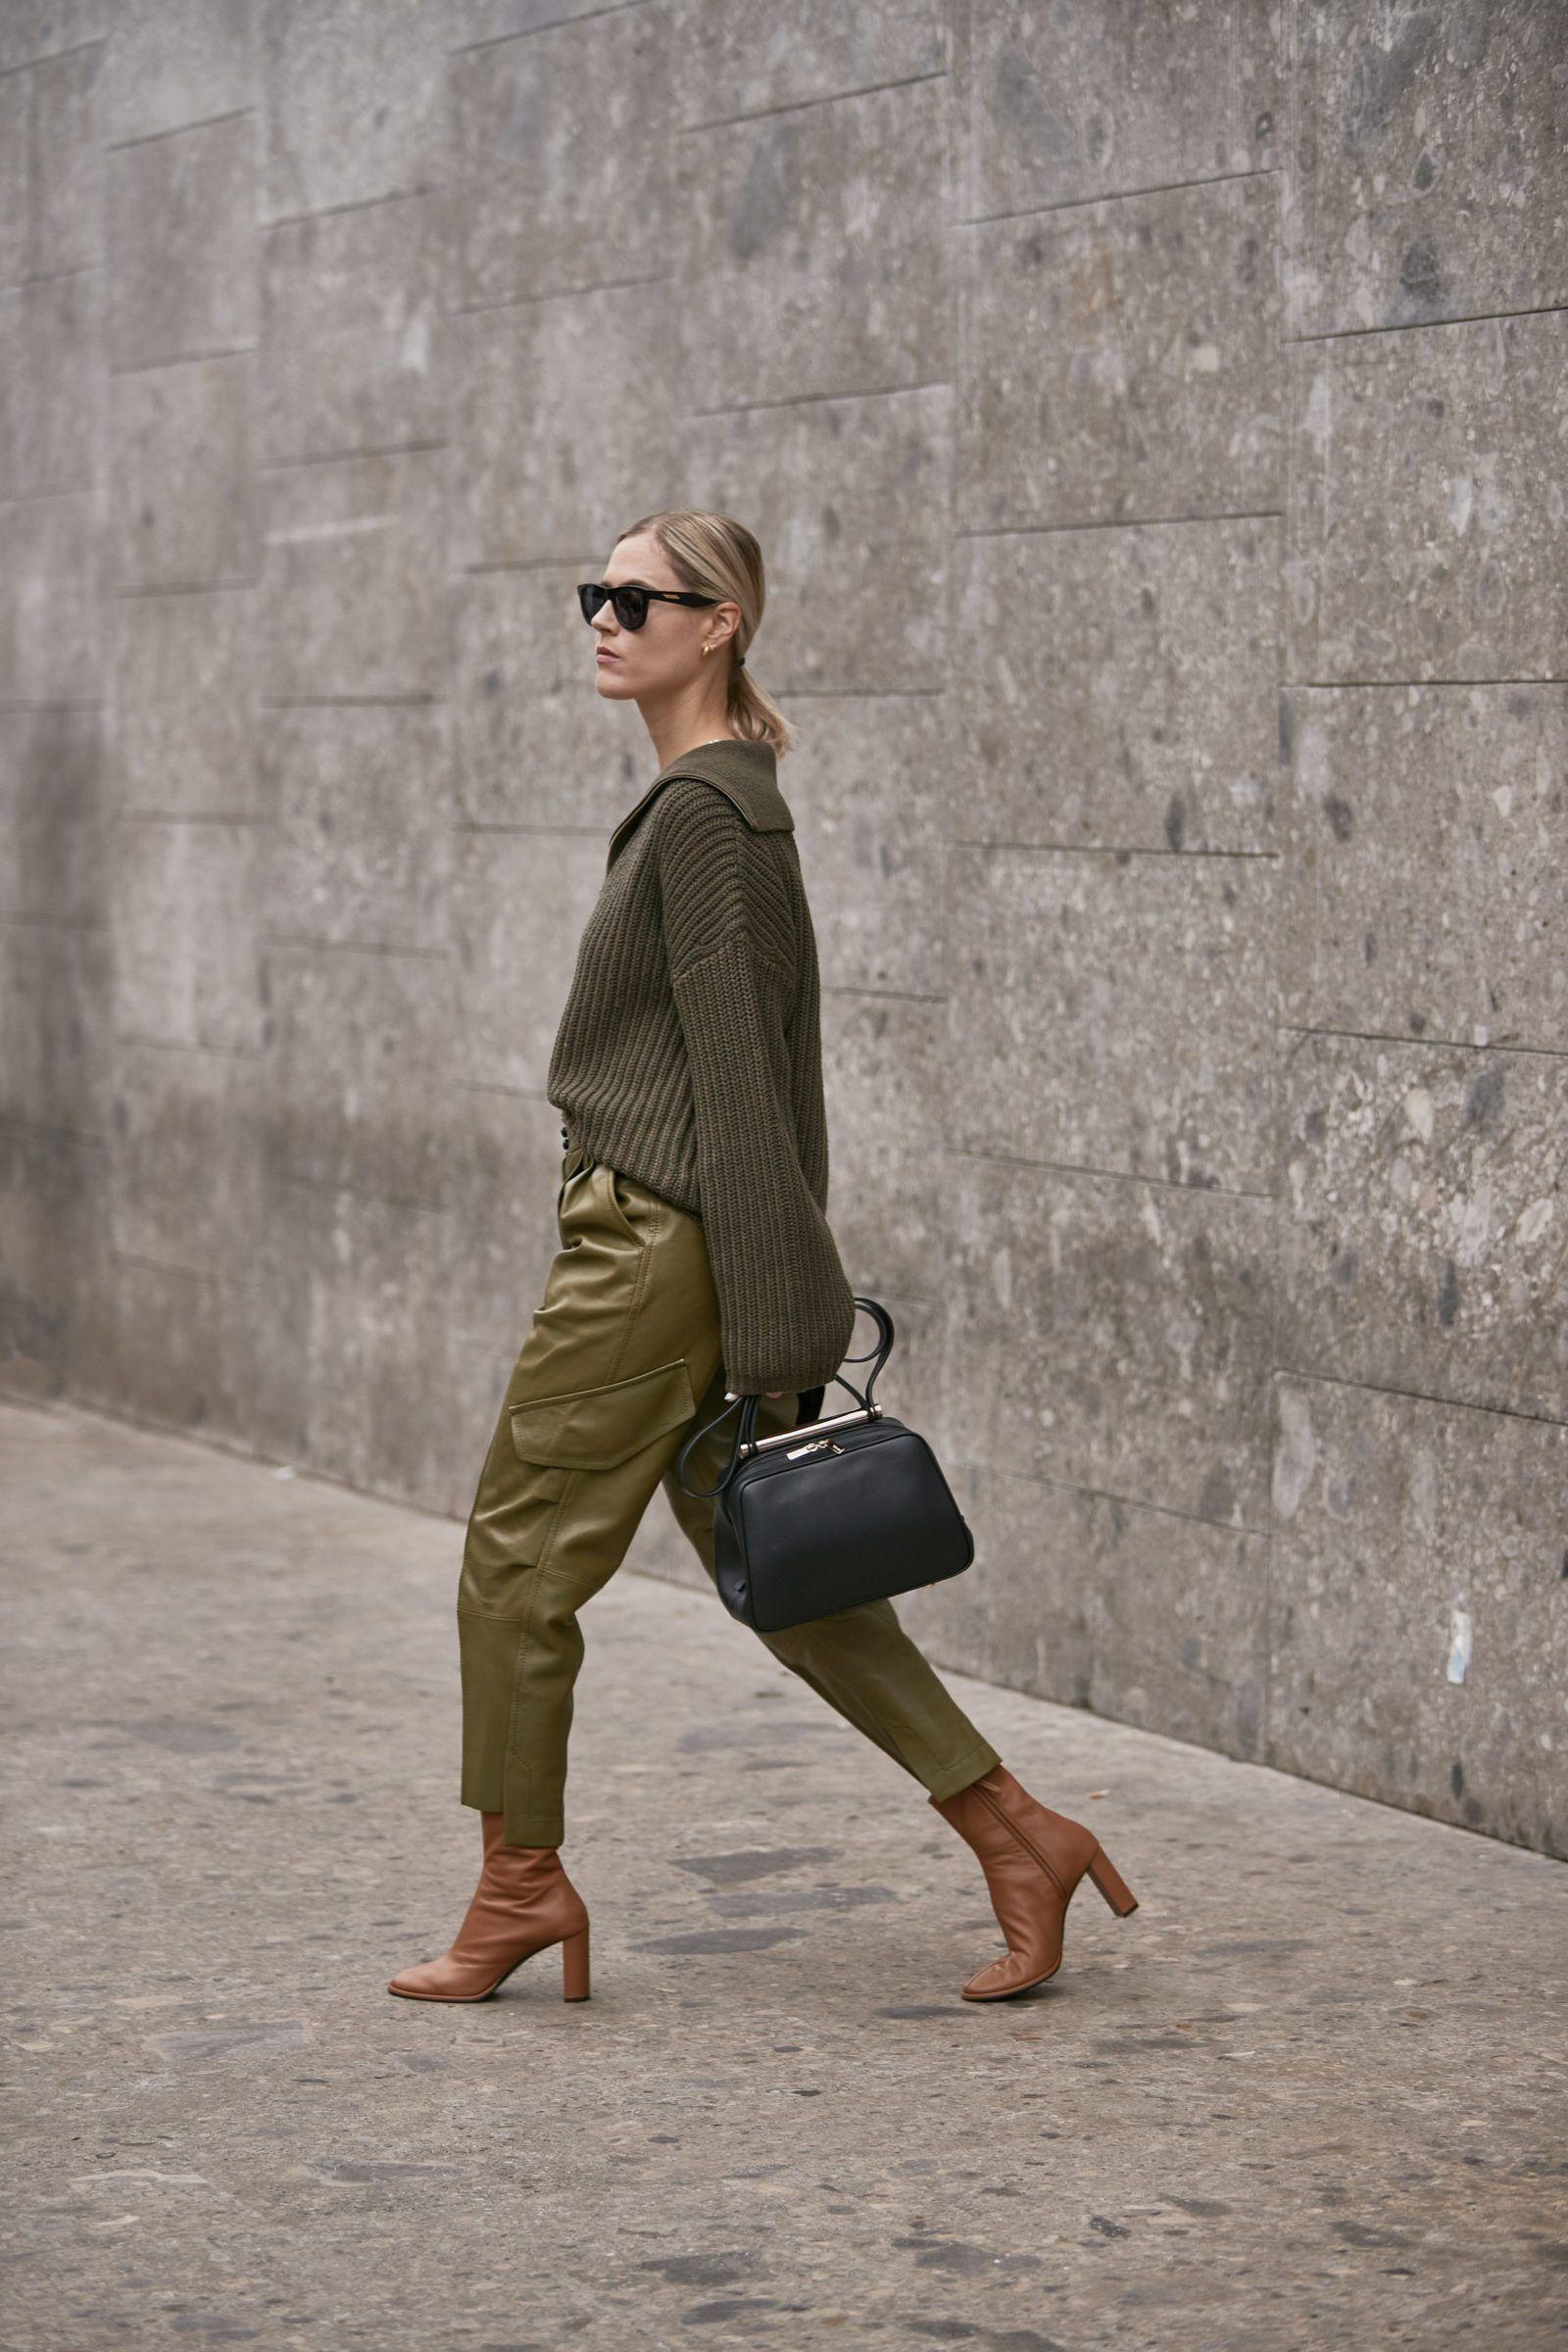 The Best Street Style Looks from Milan Fashion Week #bohostreetstyle